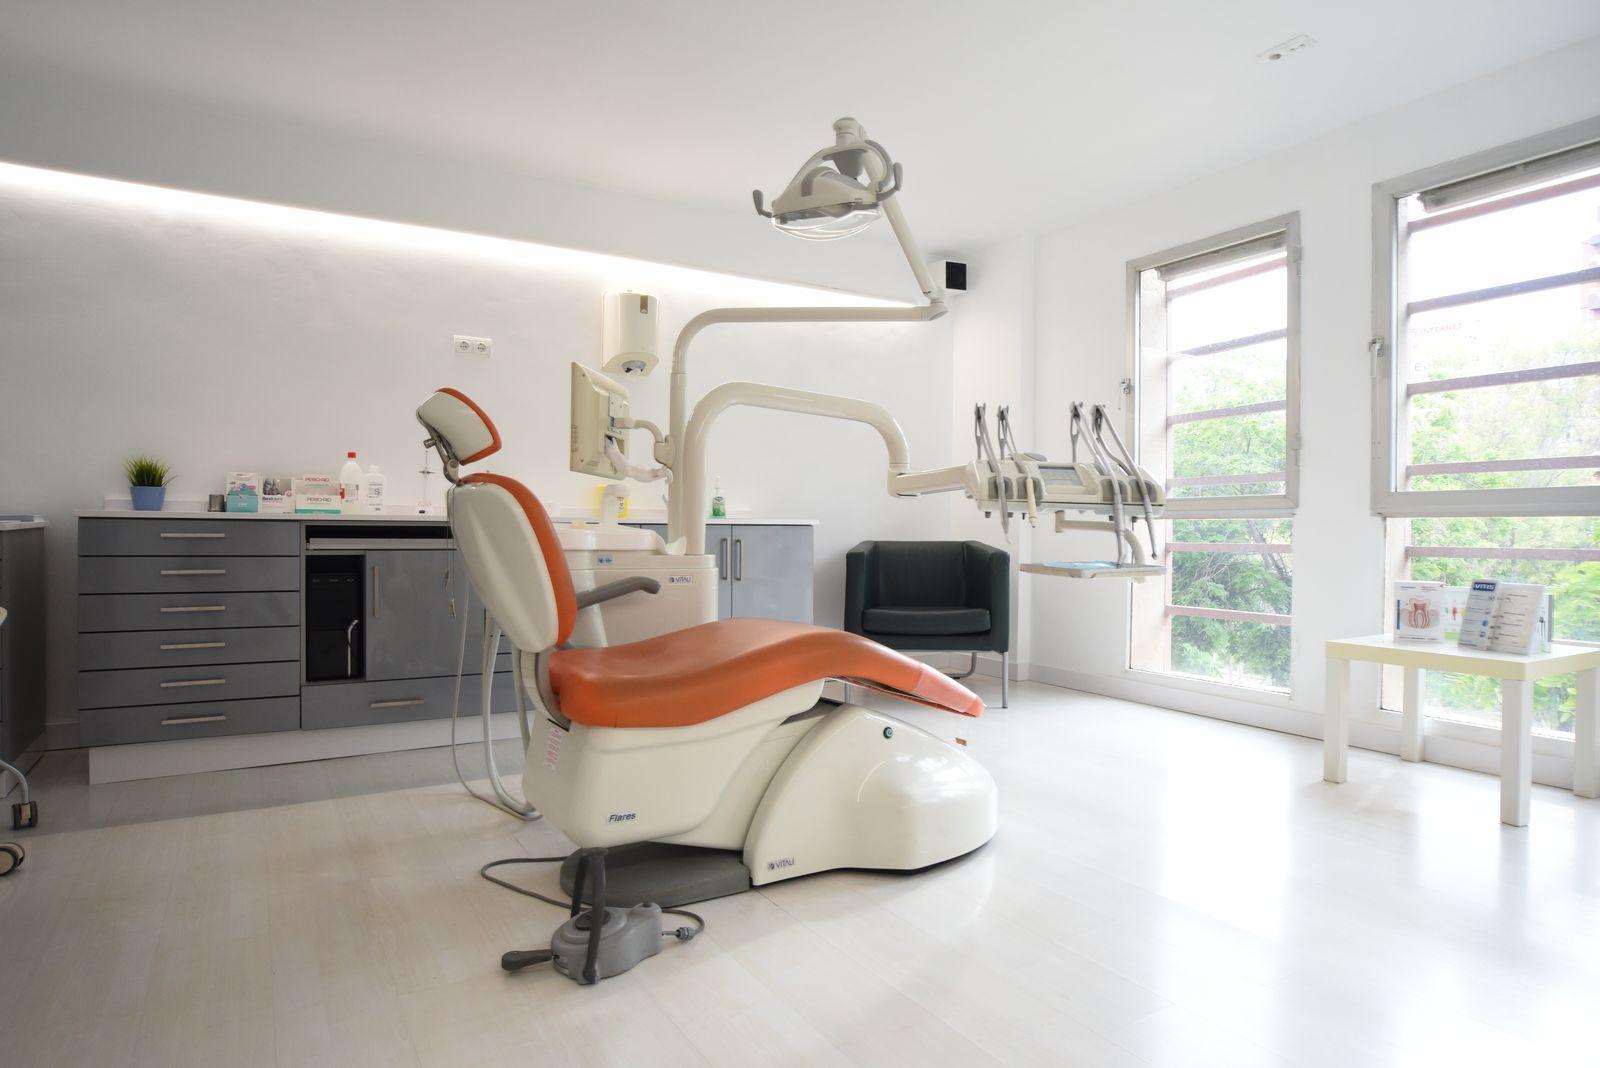 clinicas dentales en elche, clinica pons marfil, dentistas en elche, elche dentistas, dentistas elche, clinicas dentales en santa pola, clinicas dentales en crevillente, dentistas en santa pola, dentistas en crevillente